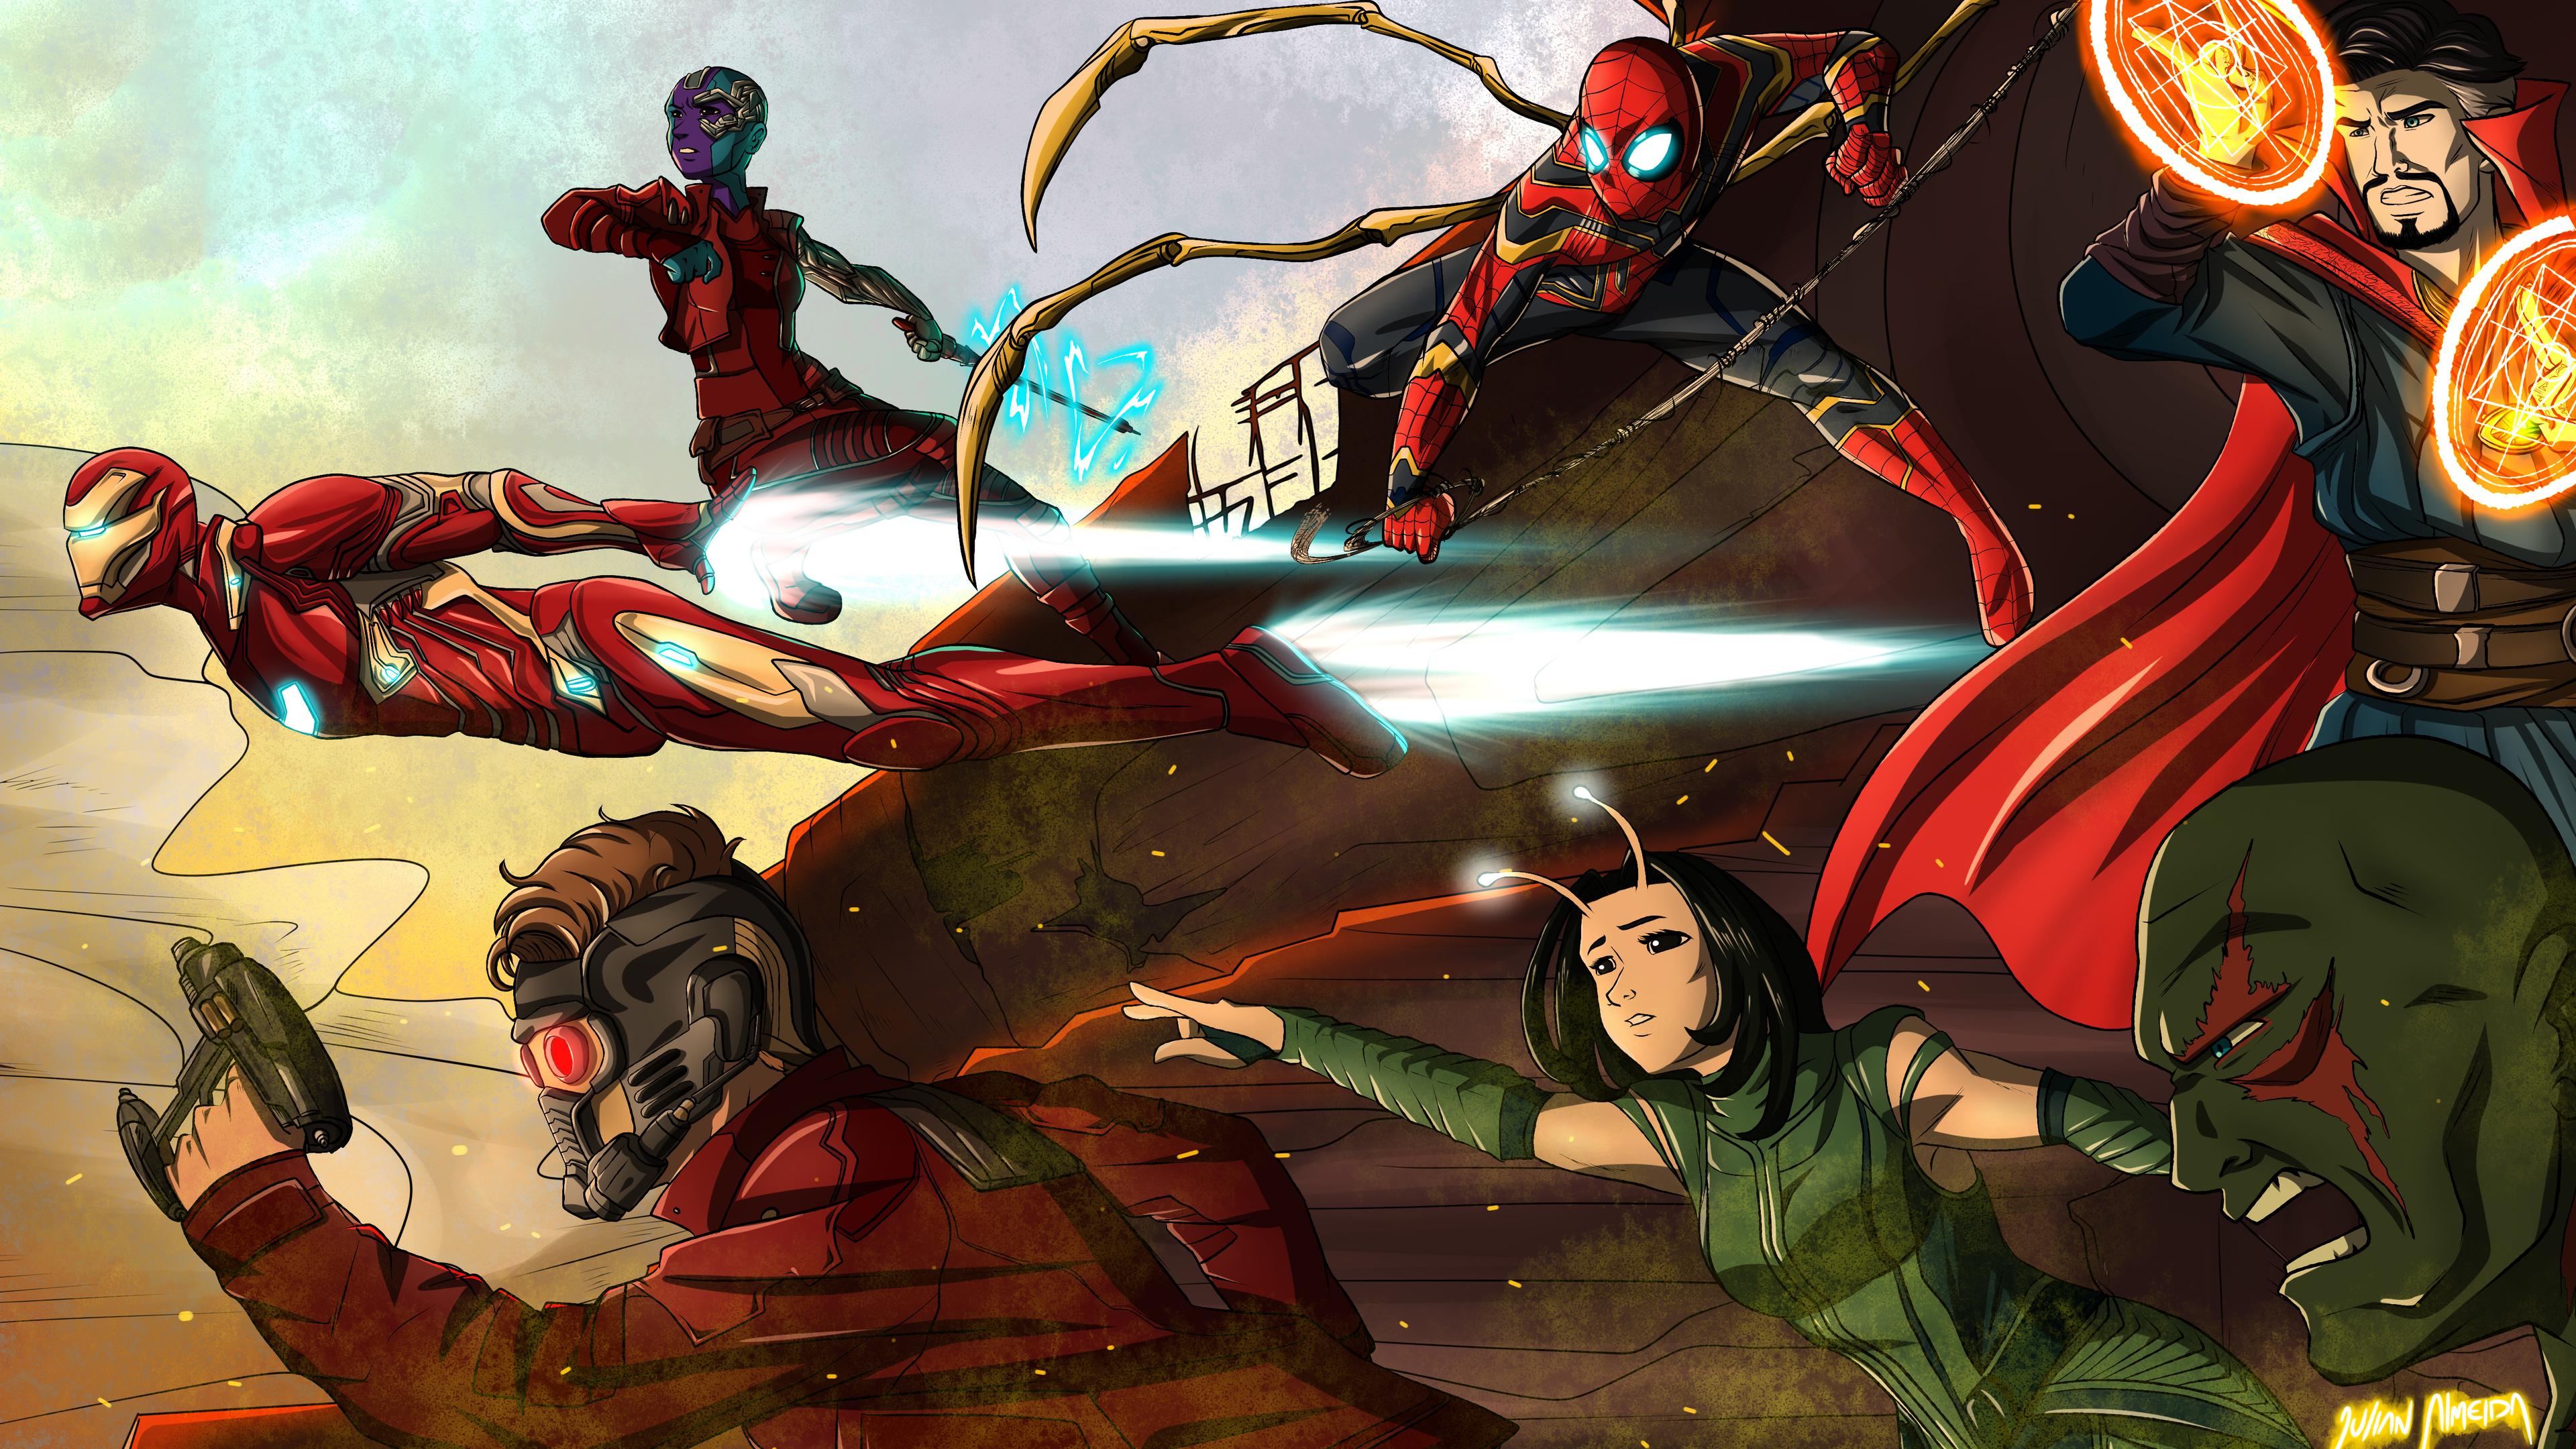 Avengers Infinity War Team 4k movies wallpapers, hd ...